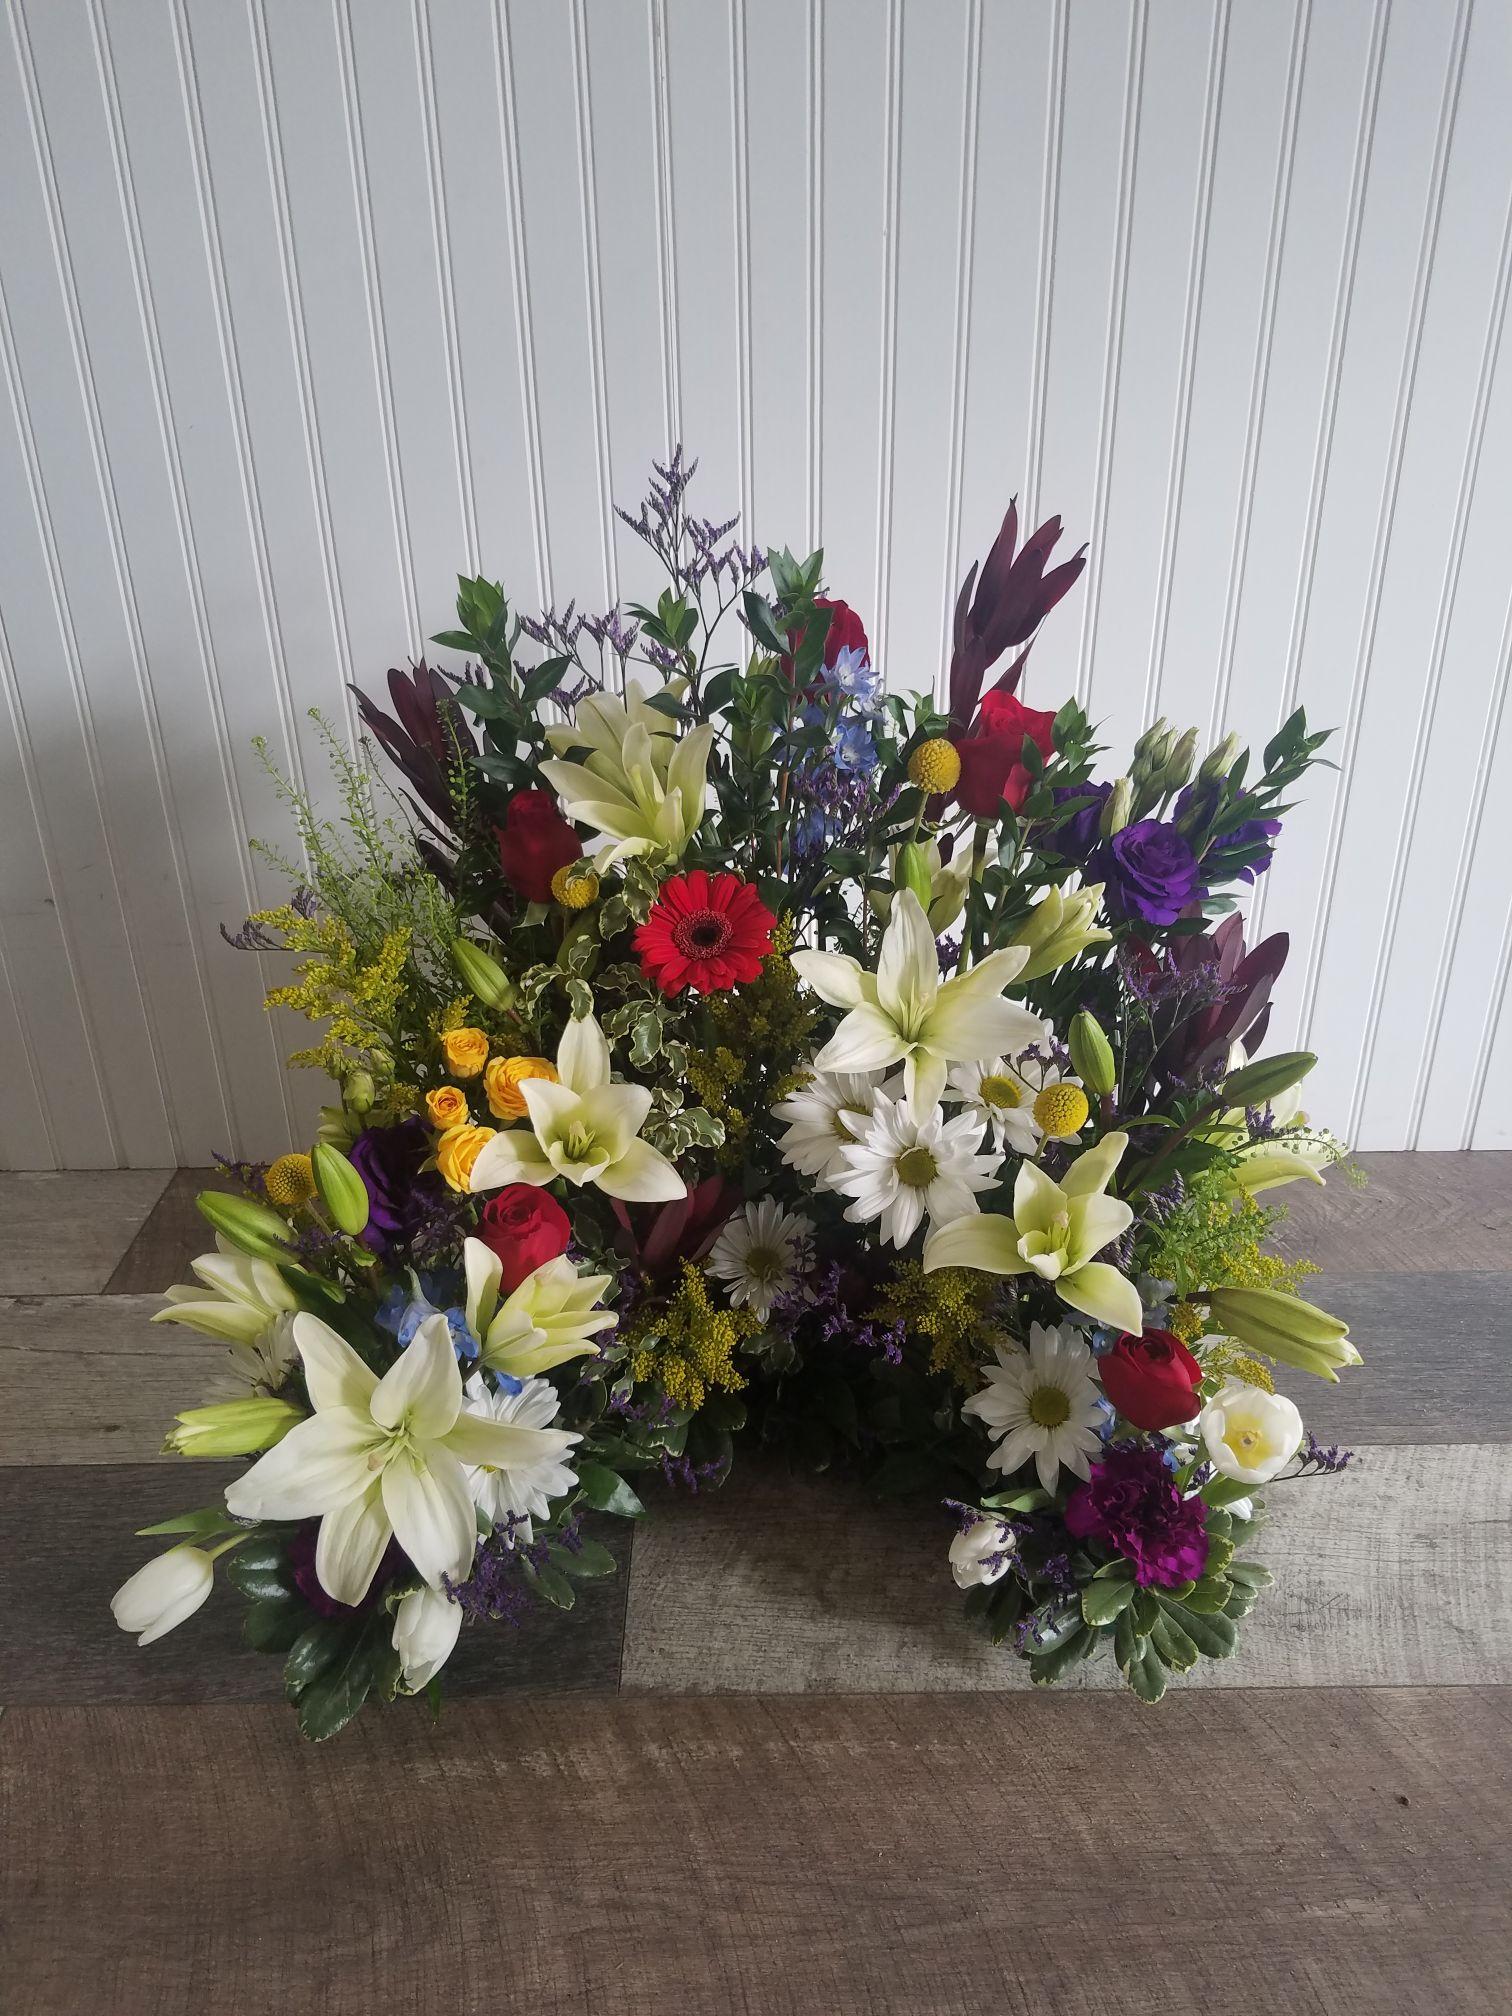 Sympathy & Funeral 9